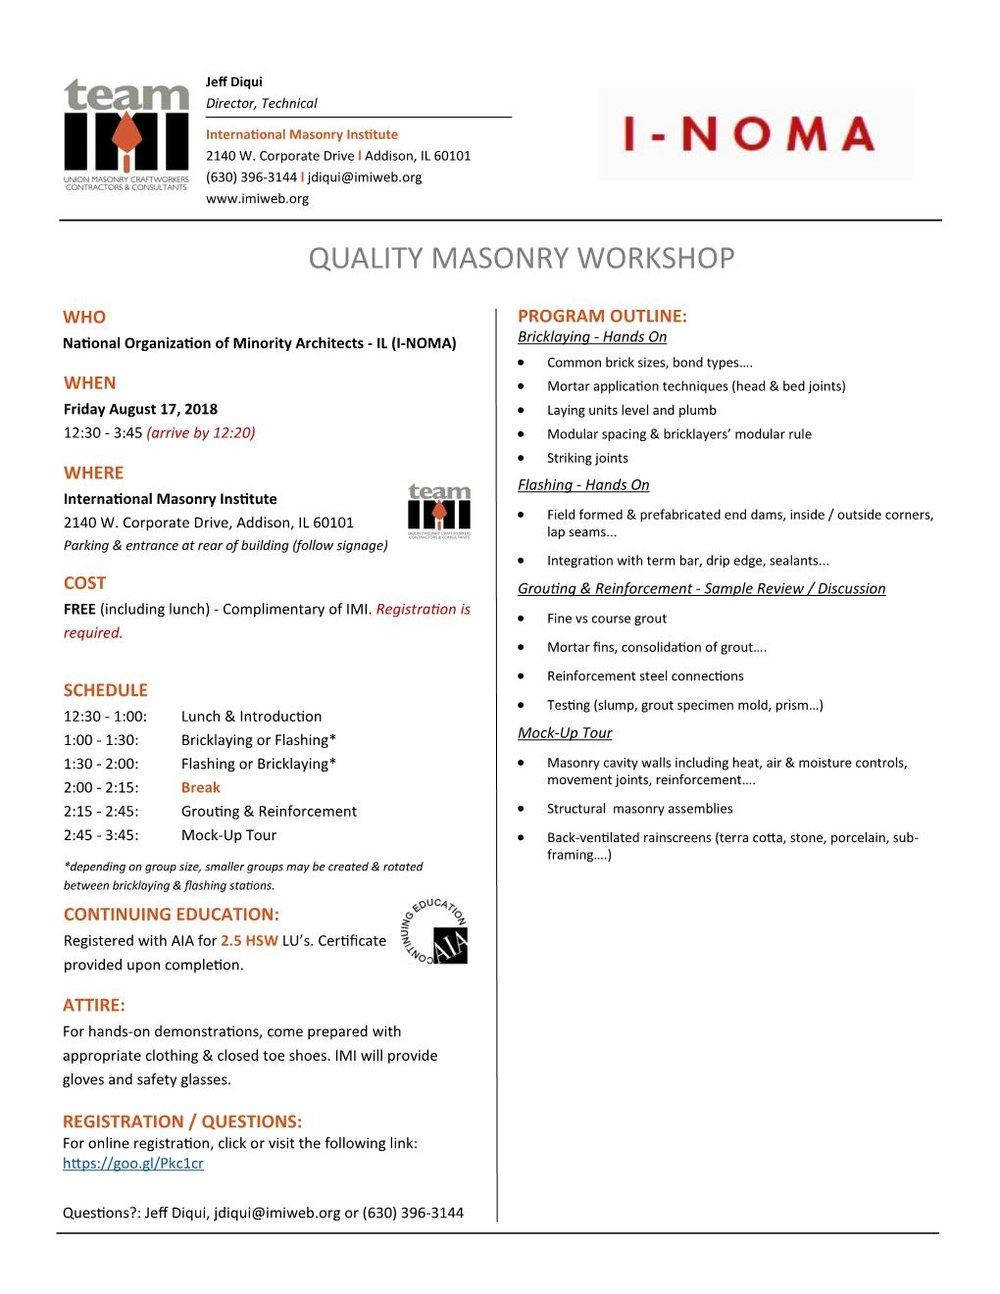 2018 08 17 Masonry Workshop Agenda (I-NOMA) - Project Pipeline.jpg